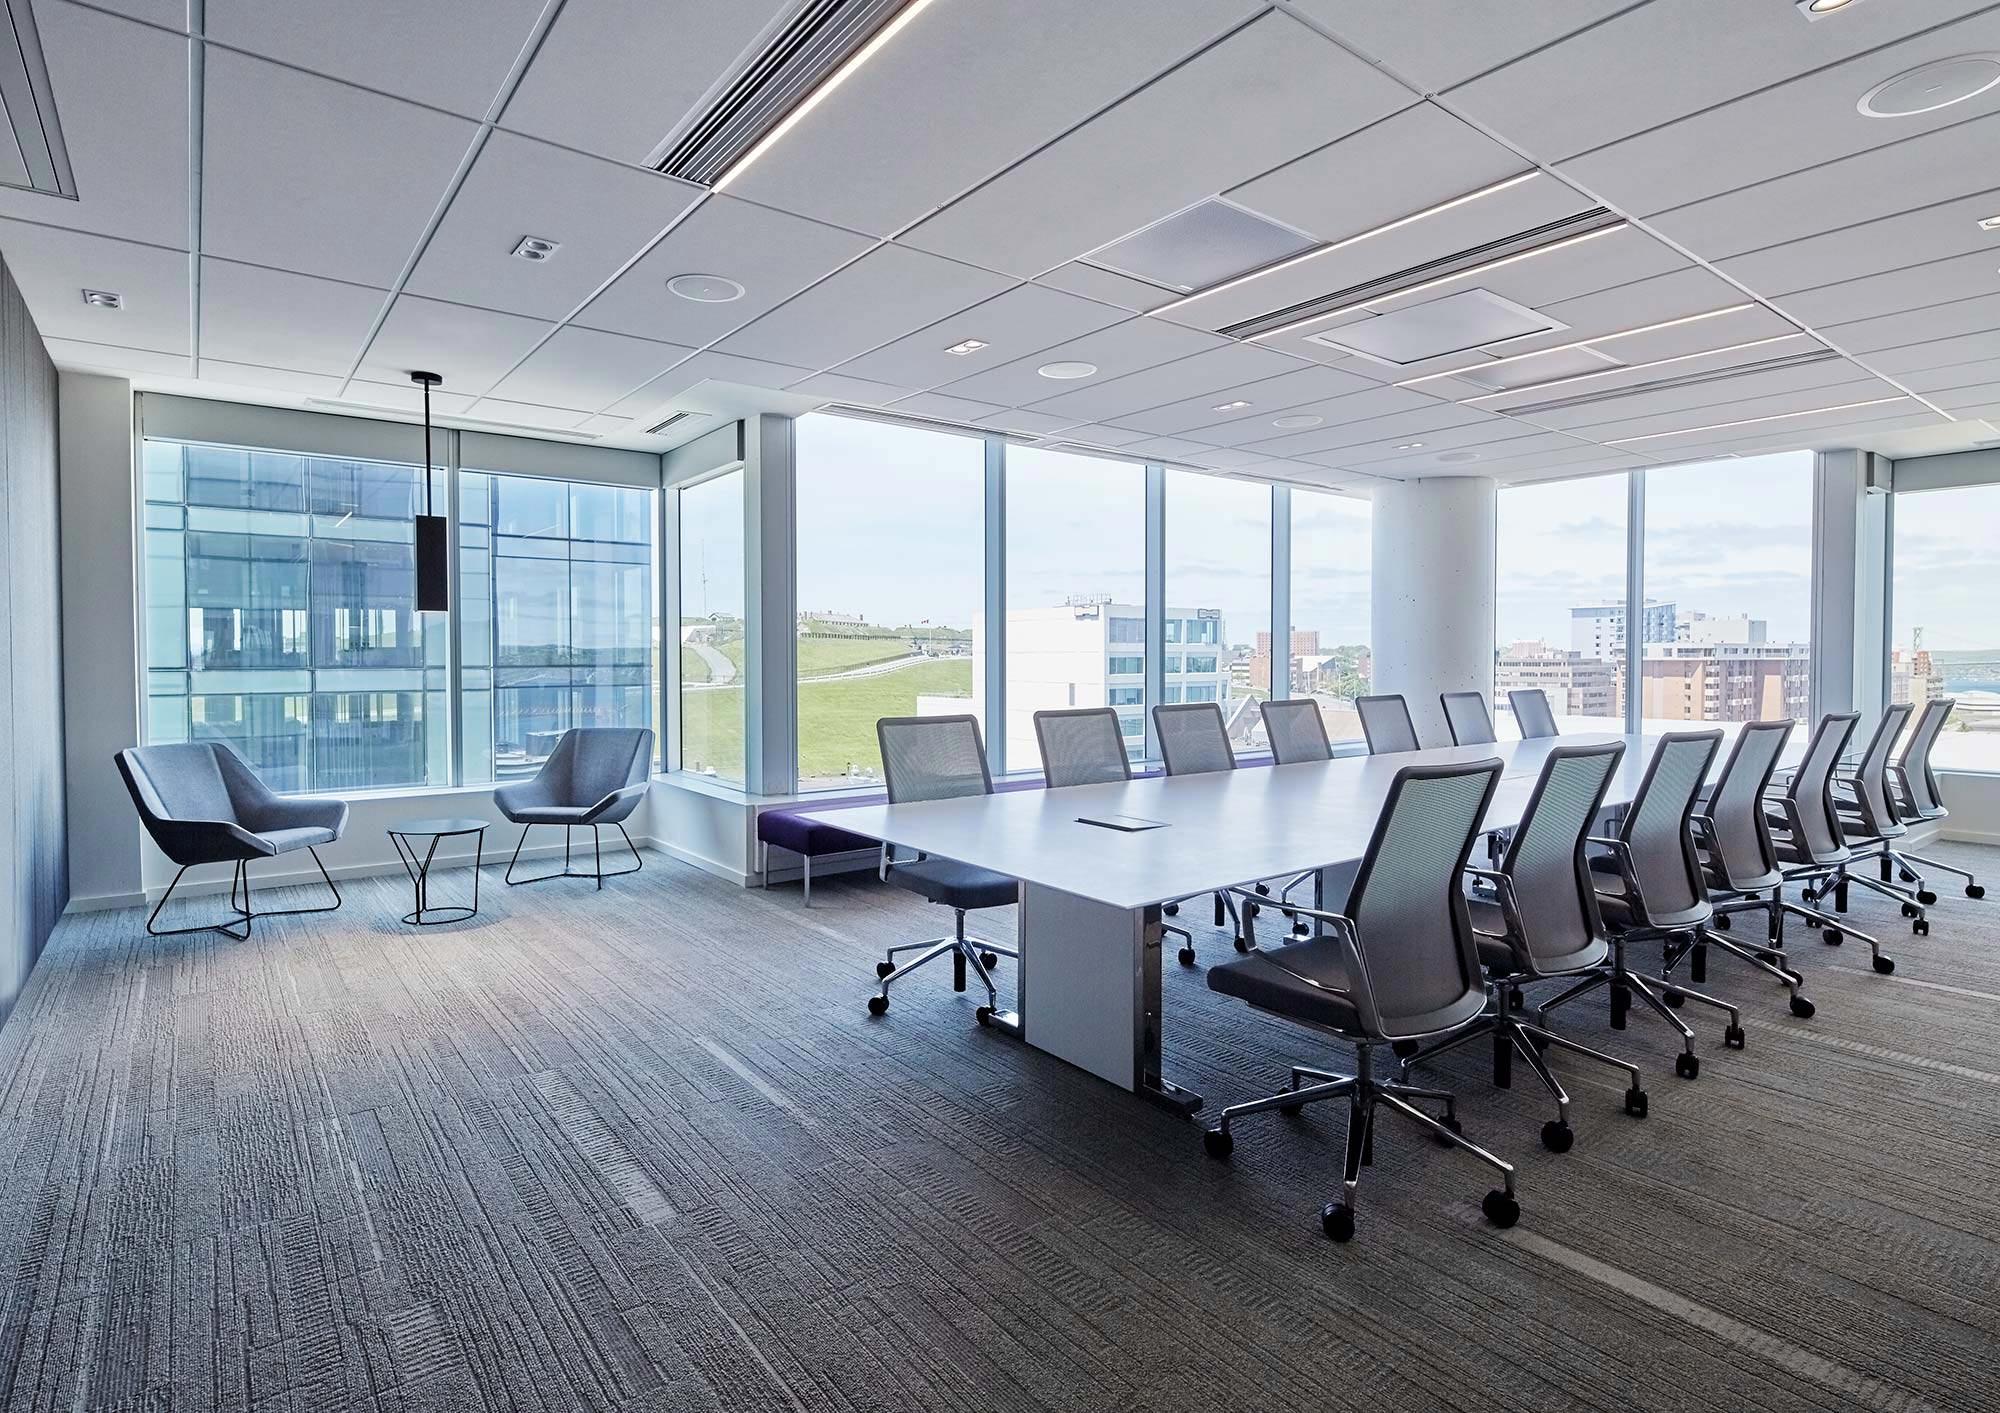 interior-design-law-office-boardroom.jpg